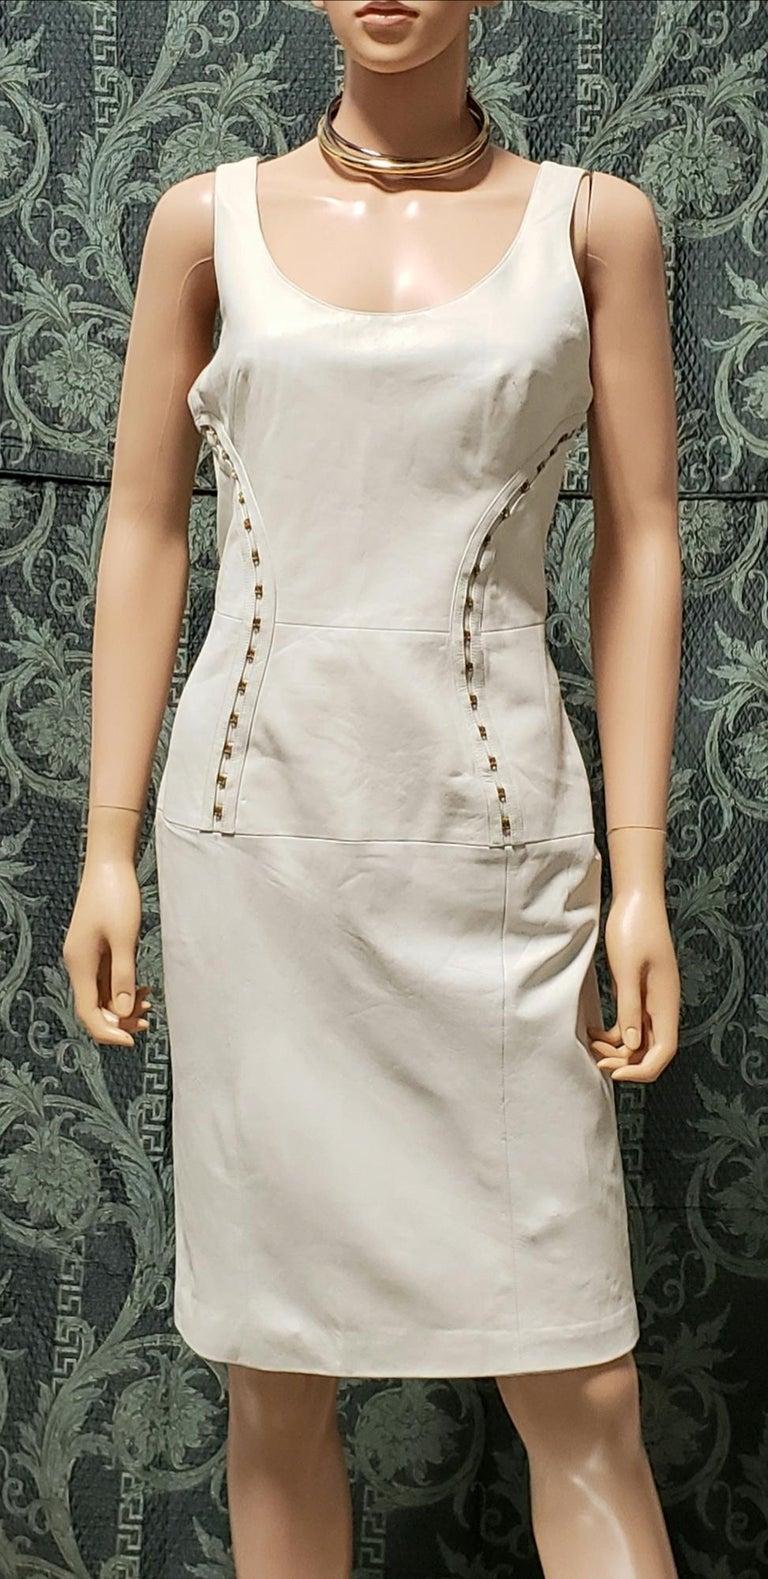 VERSACE OFF WHITE METAL HARDWARE EMBELLISHED LEATHER Dress 44 - 10 For Sale 2